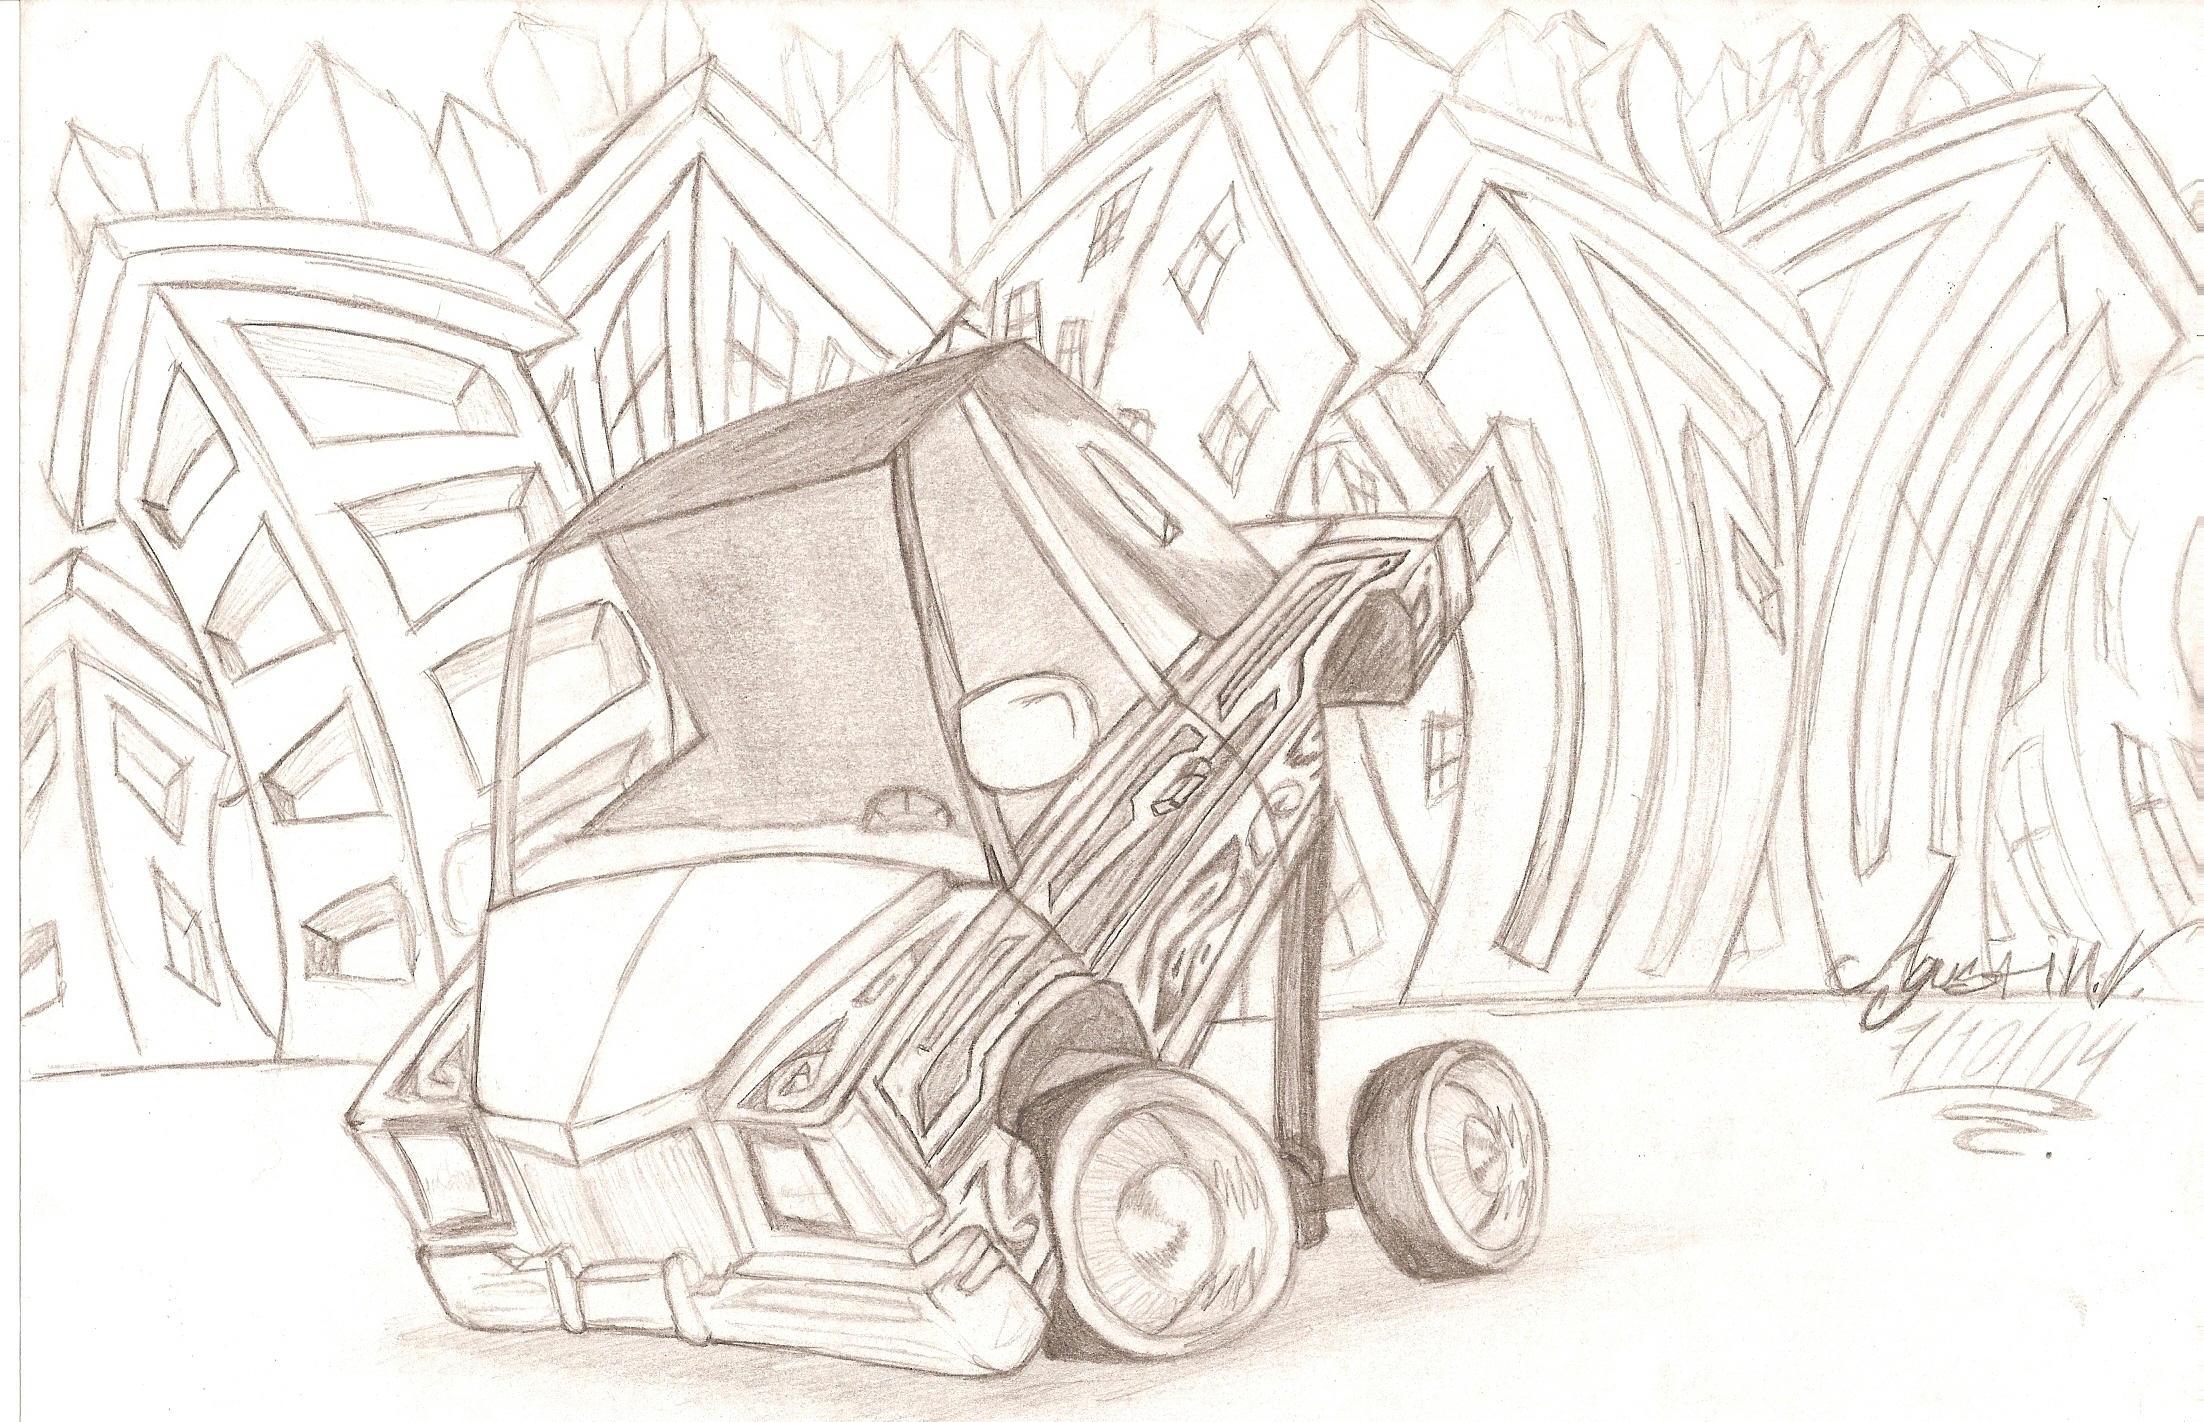 Art Lowrider Drawings Lowrider Art Drawings